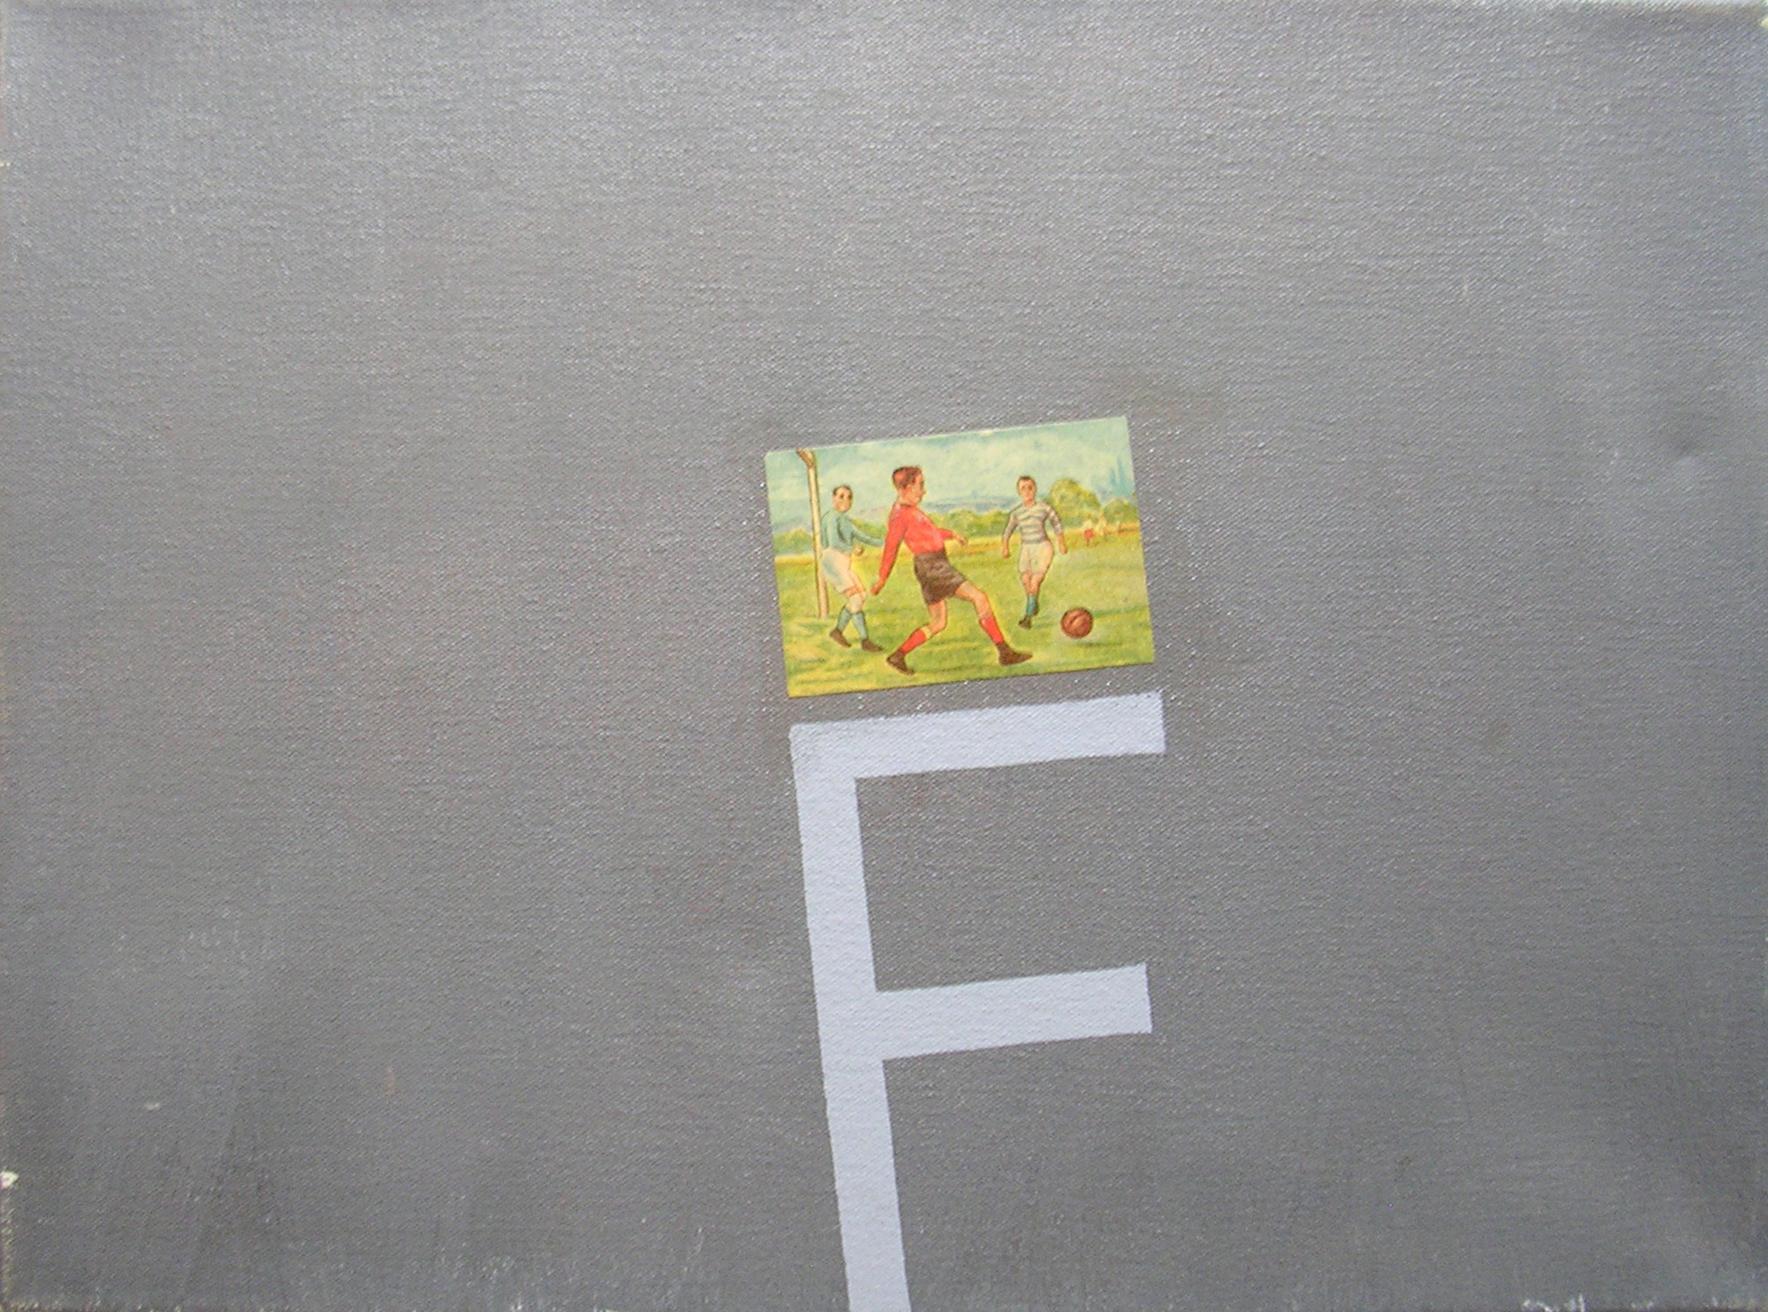 Abecedario F Fútbol; objetos ensamblados, tela, papel sobre bastidor, 30 cm x 40 cm, 2007